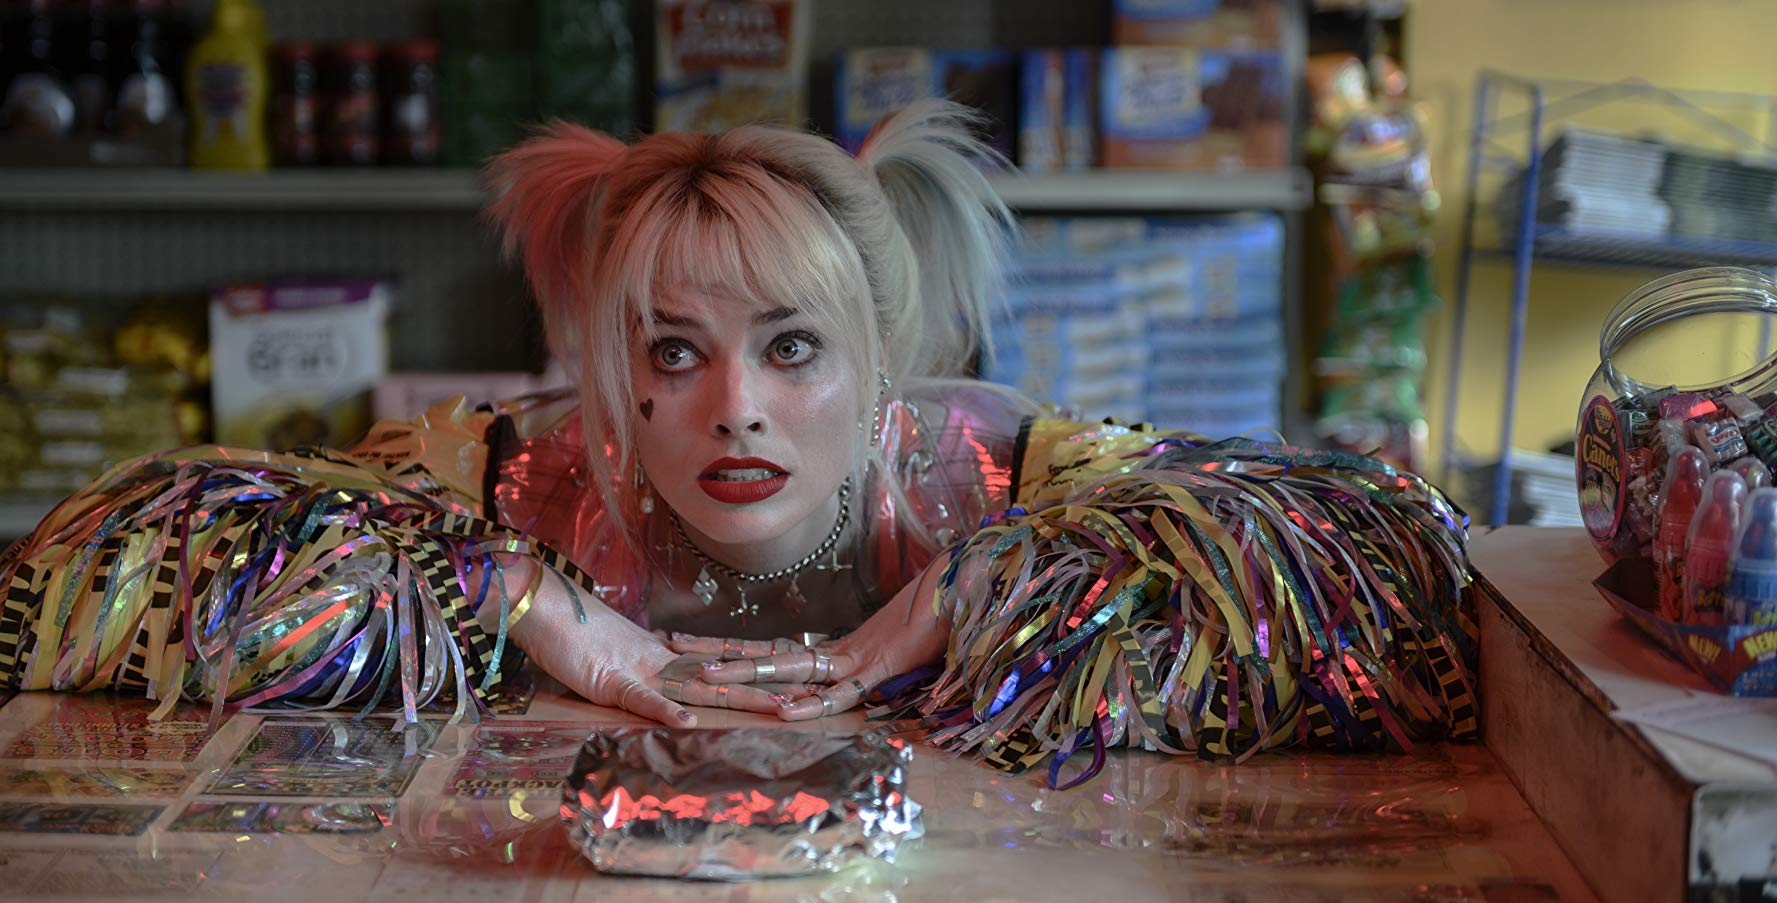 Birds Of Prey - E la fantasmagorica rinascita di Harley Quinn: Margot Robbie durante una scena del film